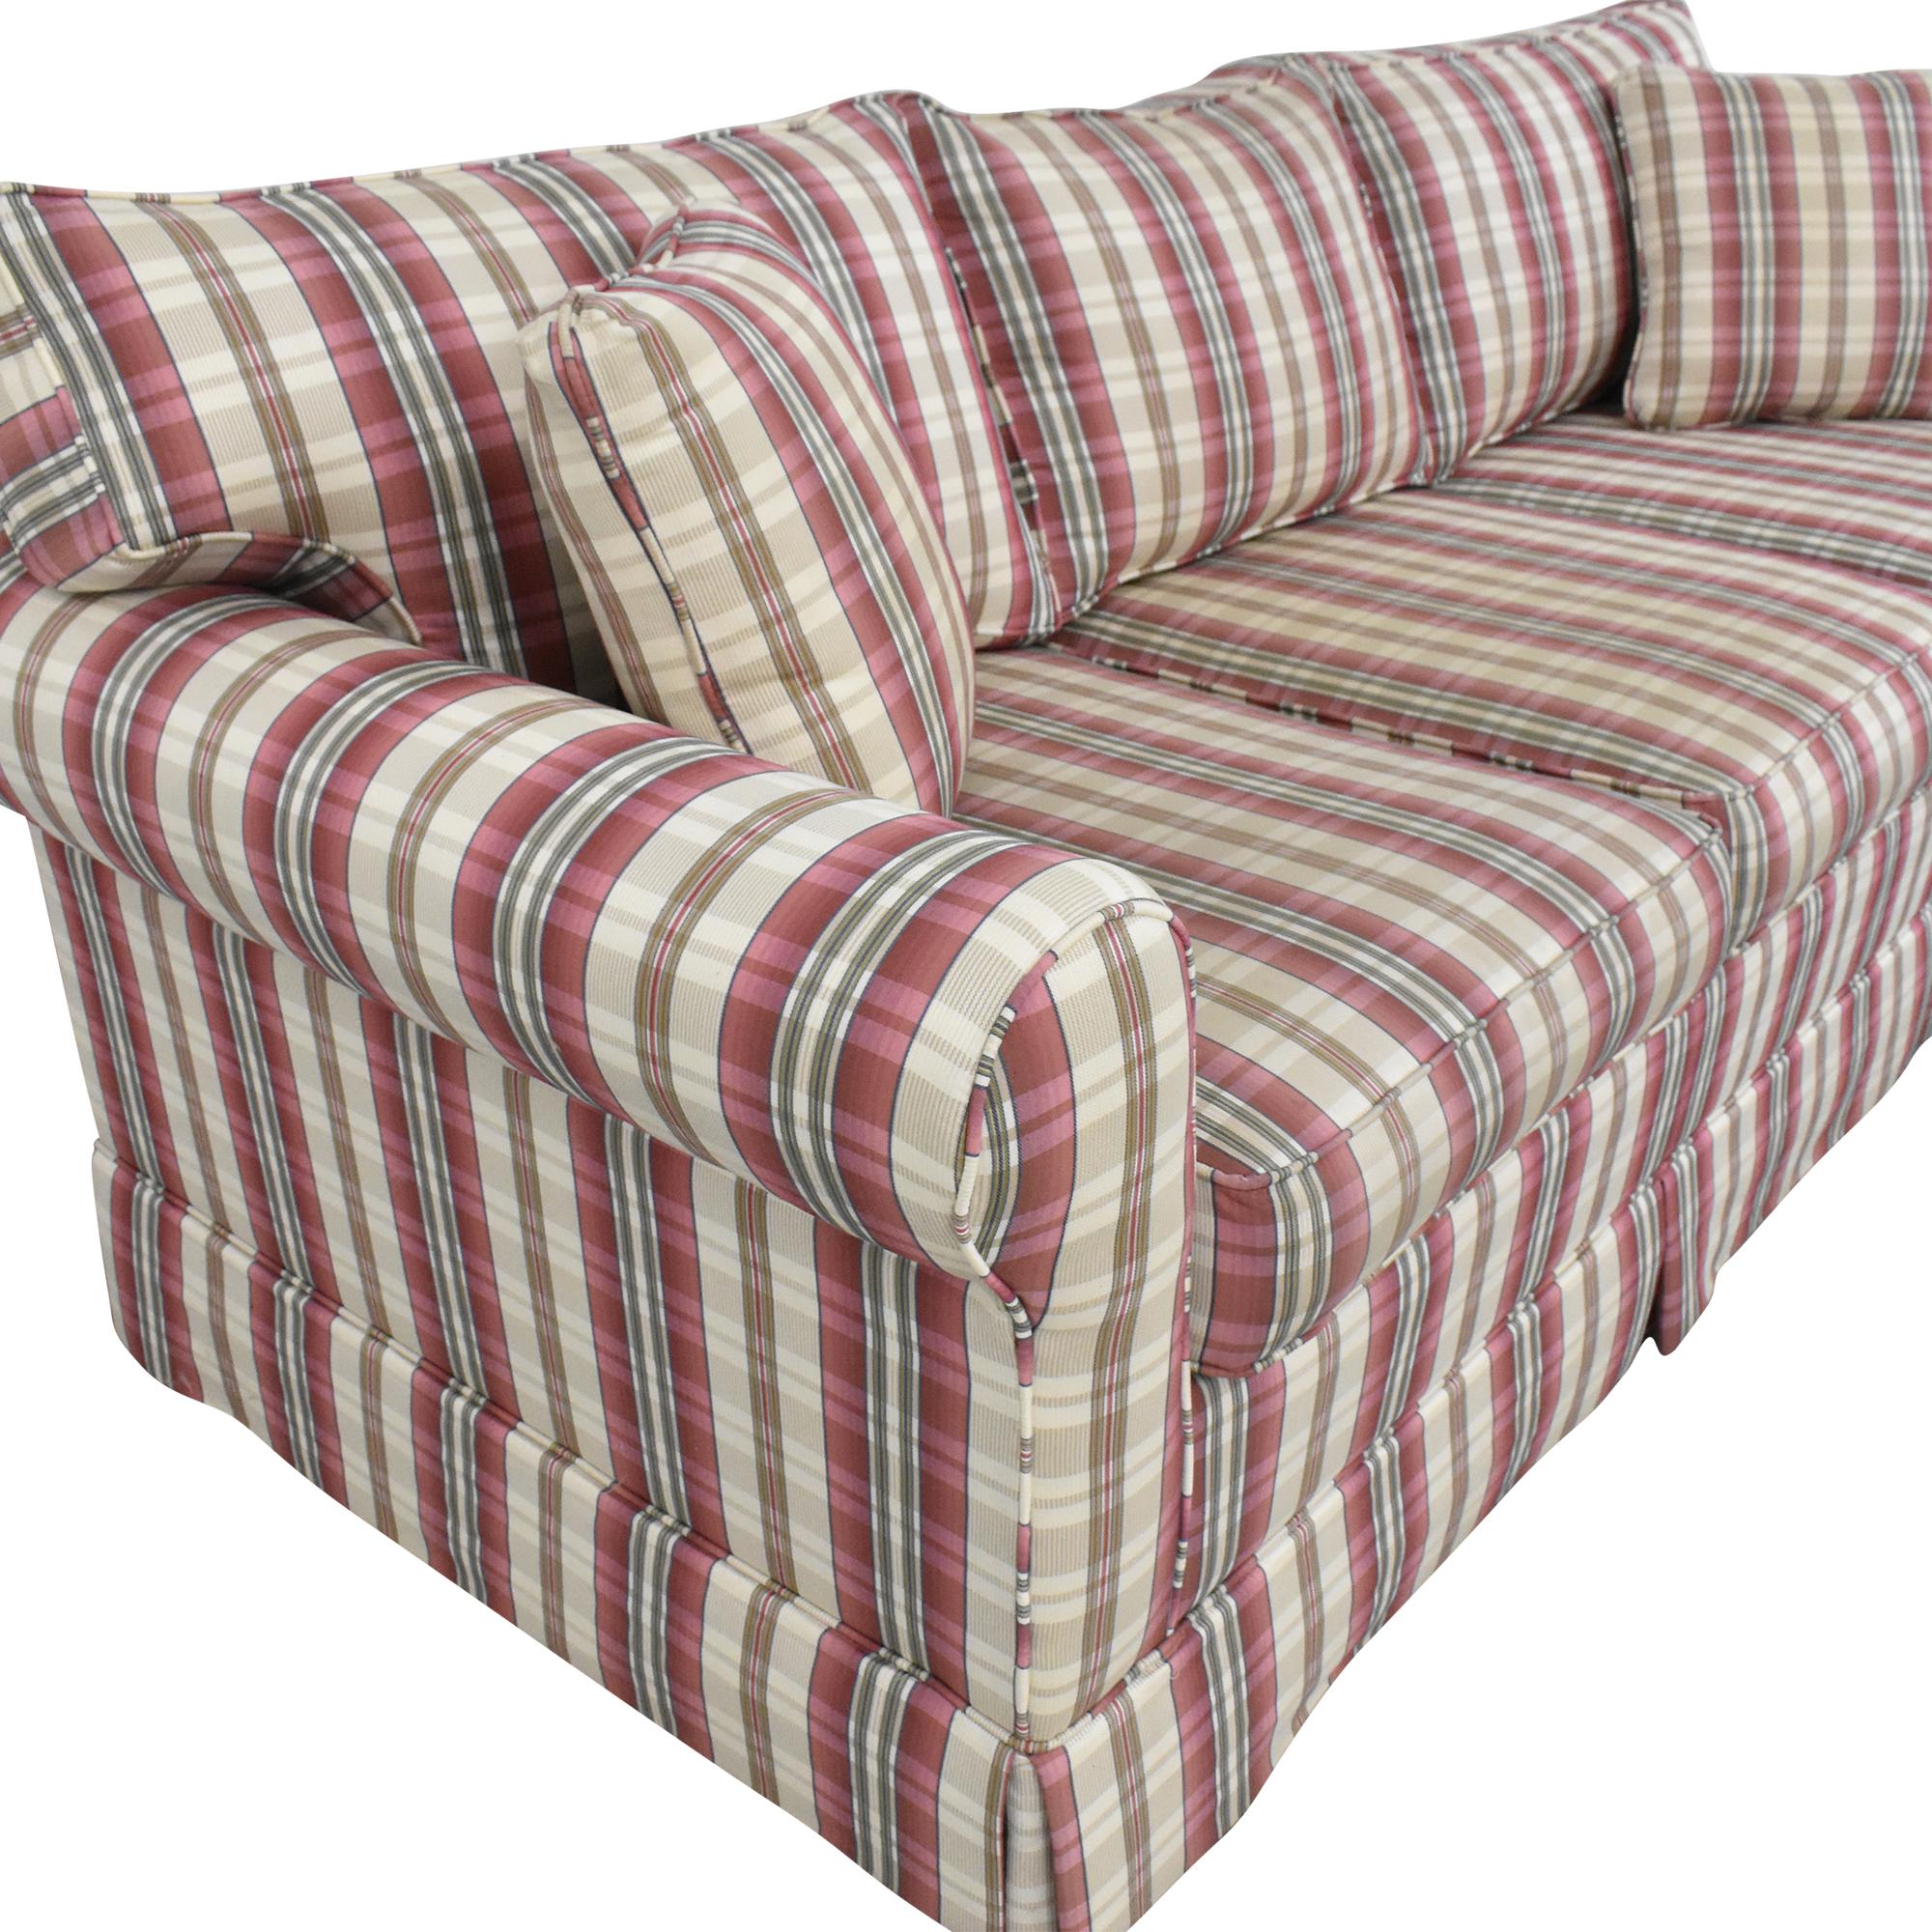 Choice Seating Gallery Choice Seating Gallery Skirted Three Cushion Sofa pa